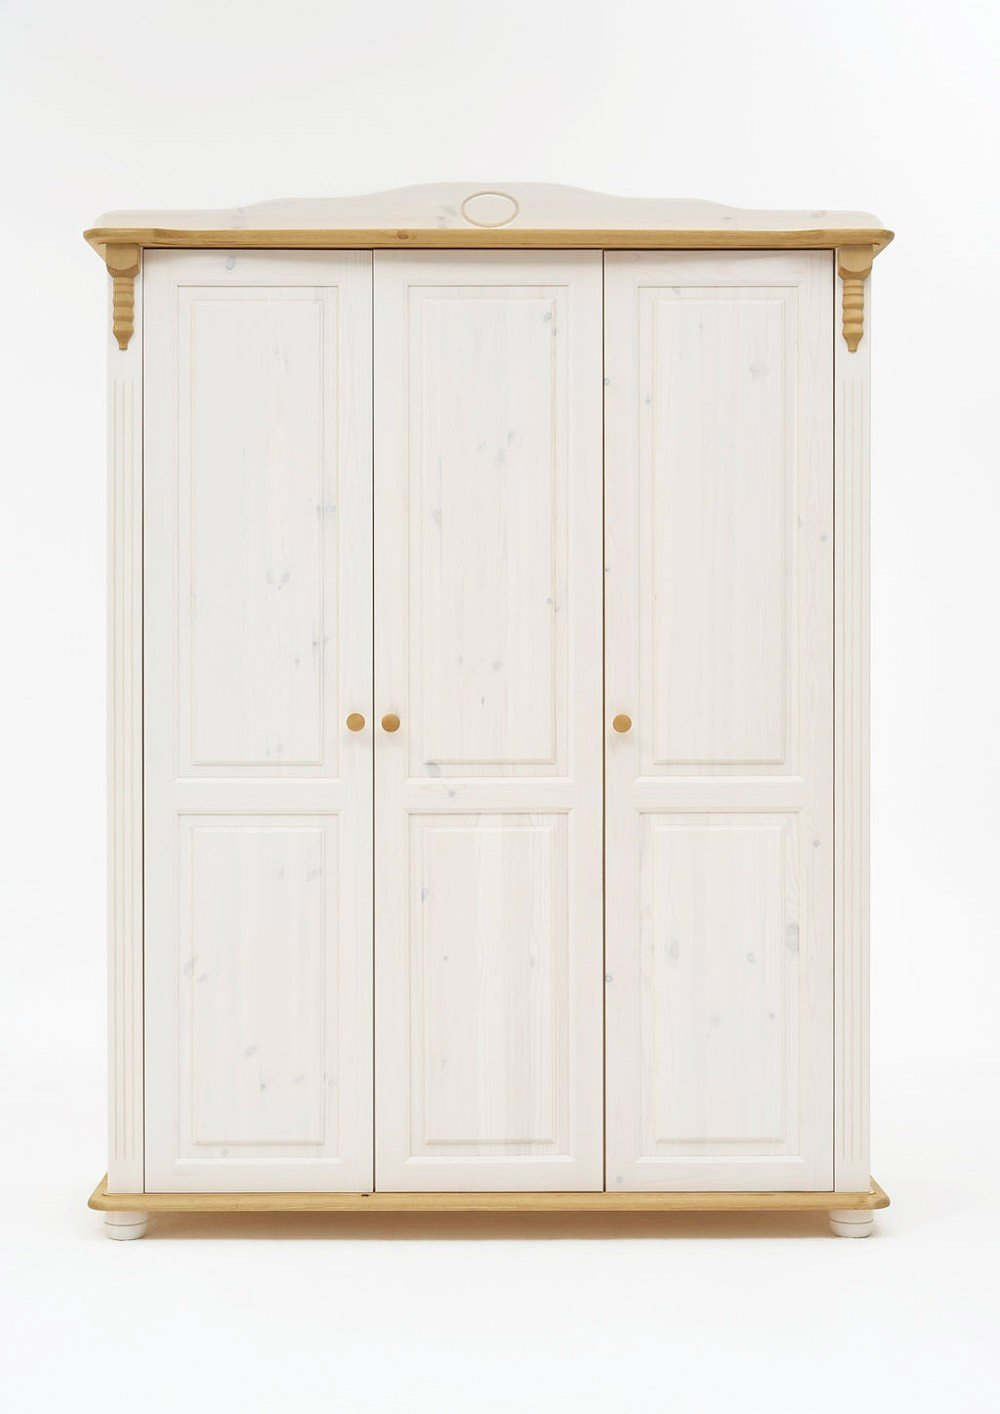 infans romantik kleiderschrank 3 trg 103 im wallenfels. Black Bedroom Furniture Sets. Home Design Ideas